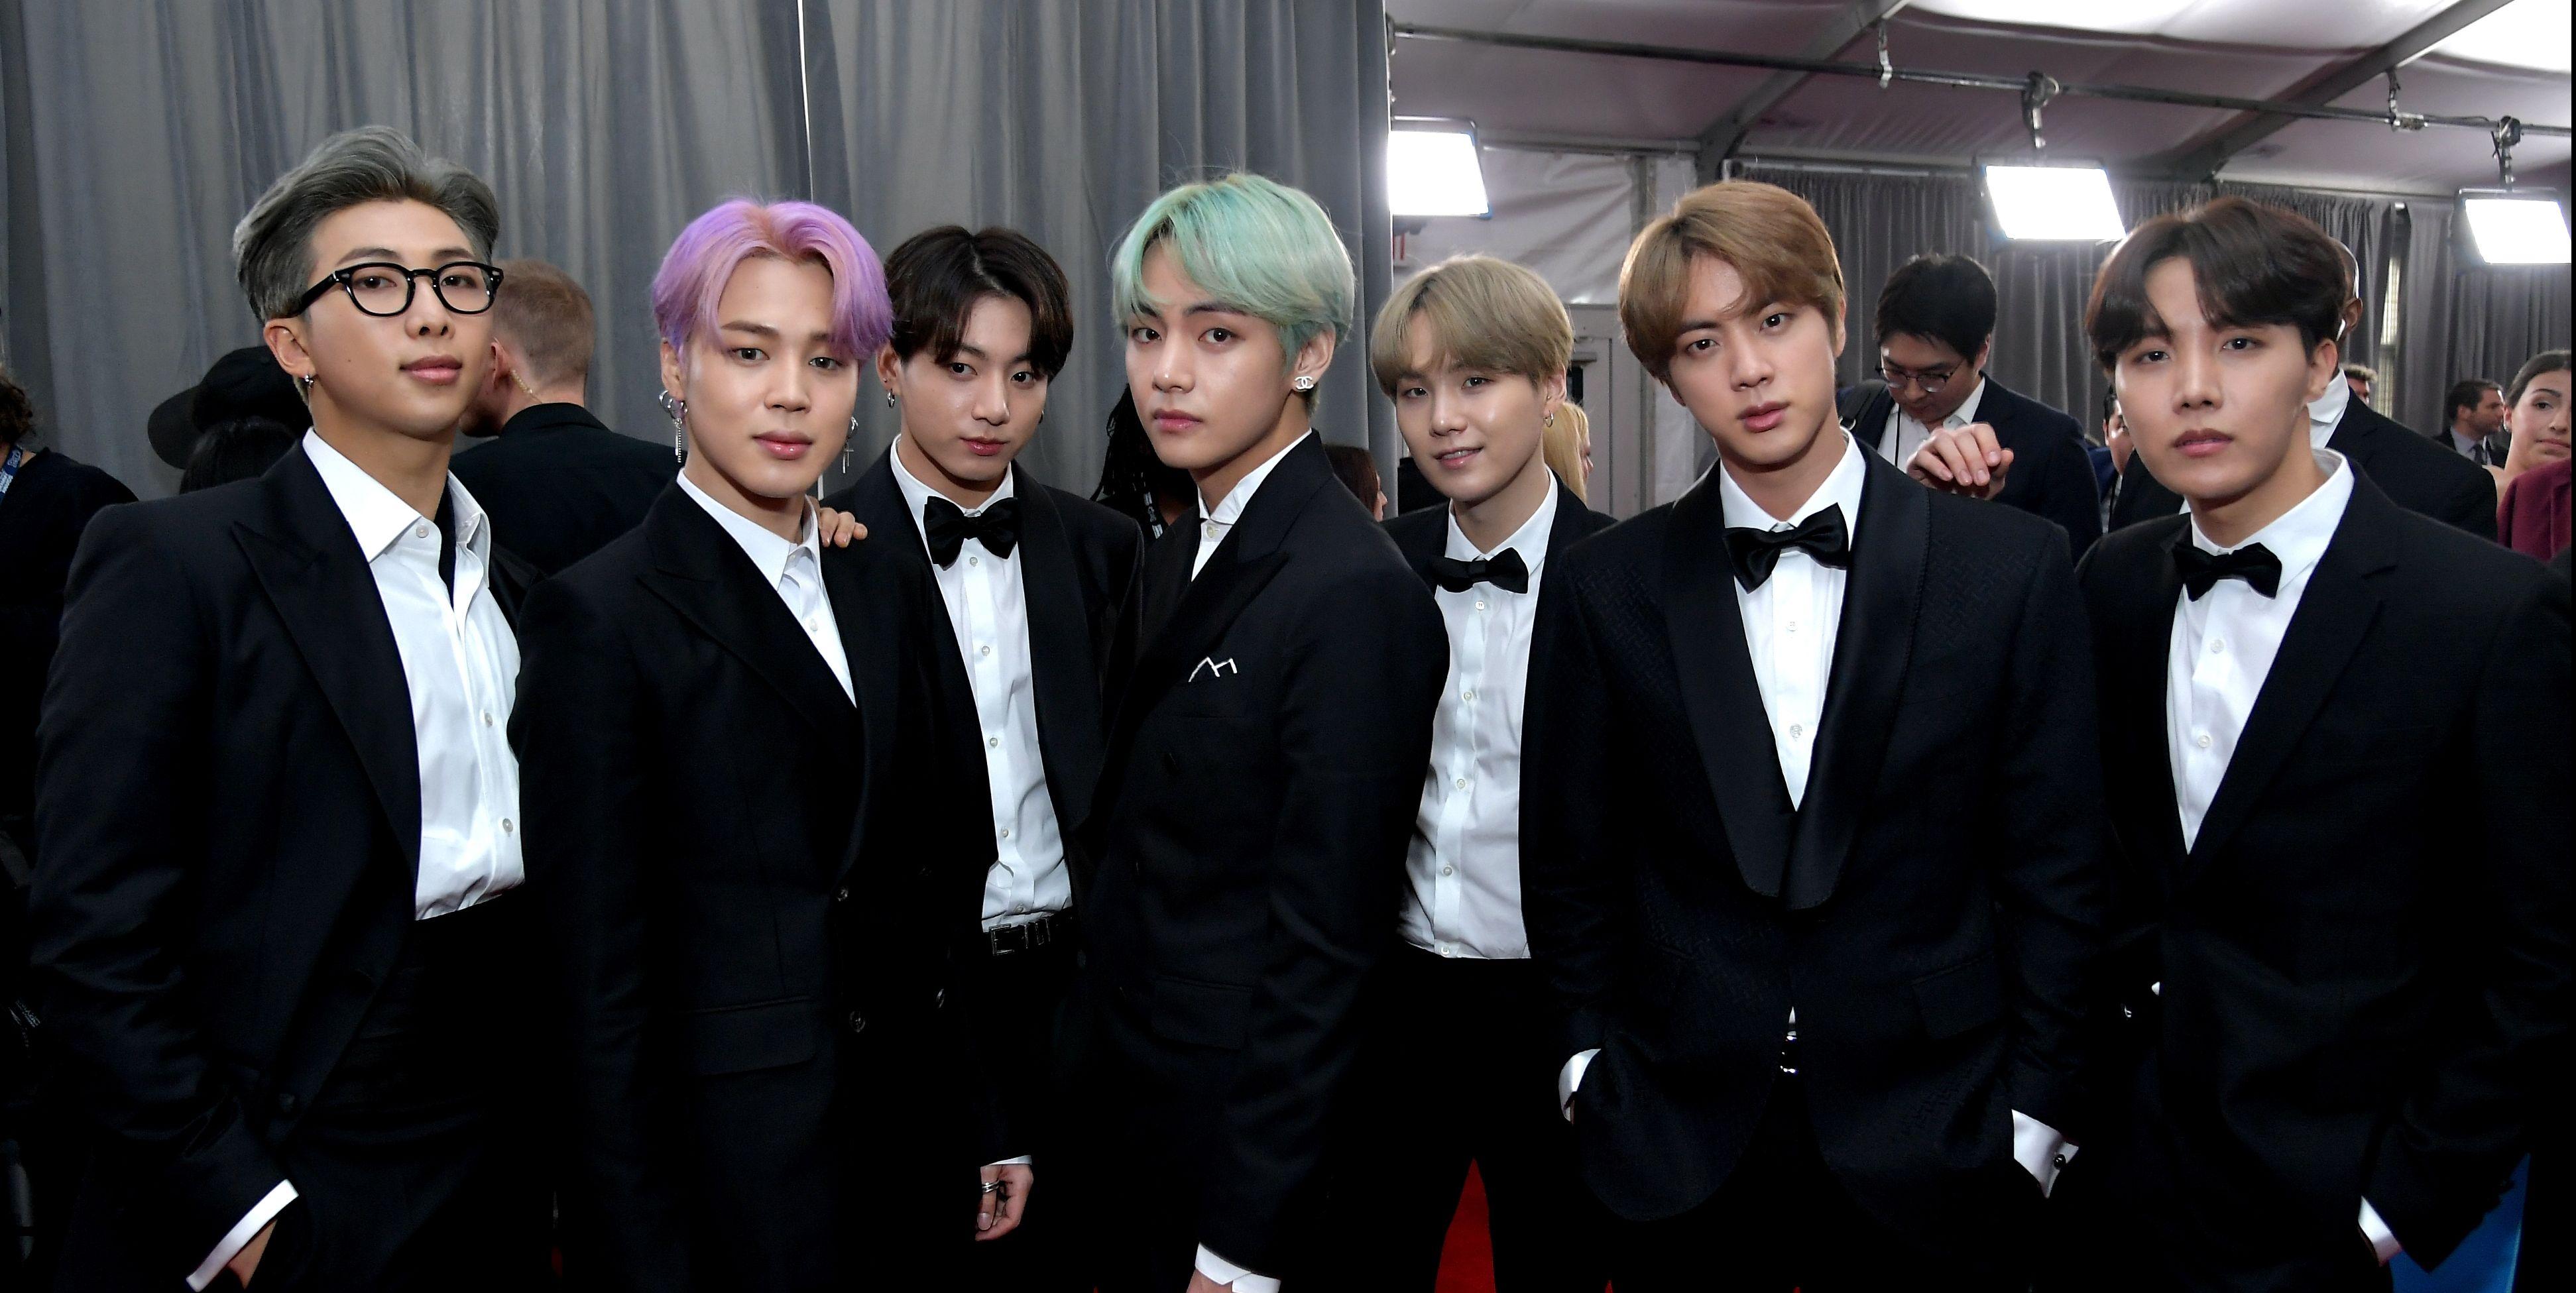 Grammy 2019 Bts: What BTS's V, RM, Suga, Jimin, Jungkook, Jin, And J-Hope